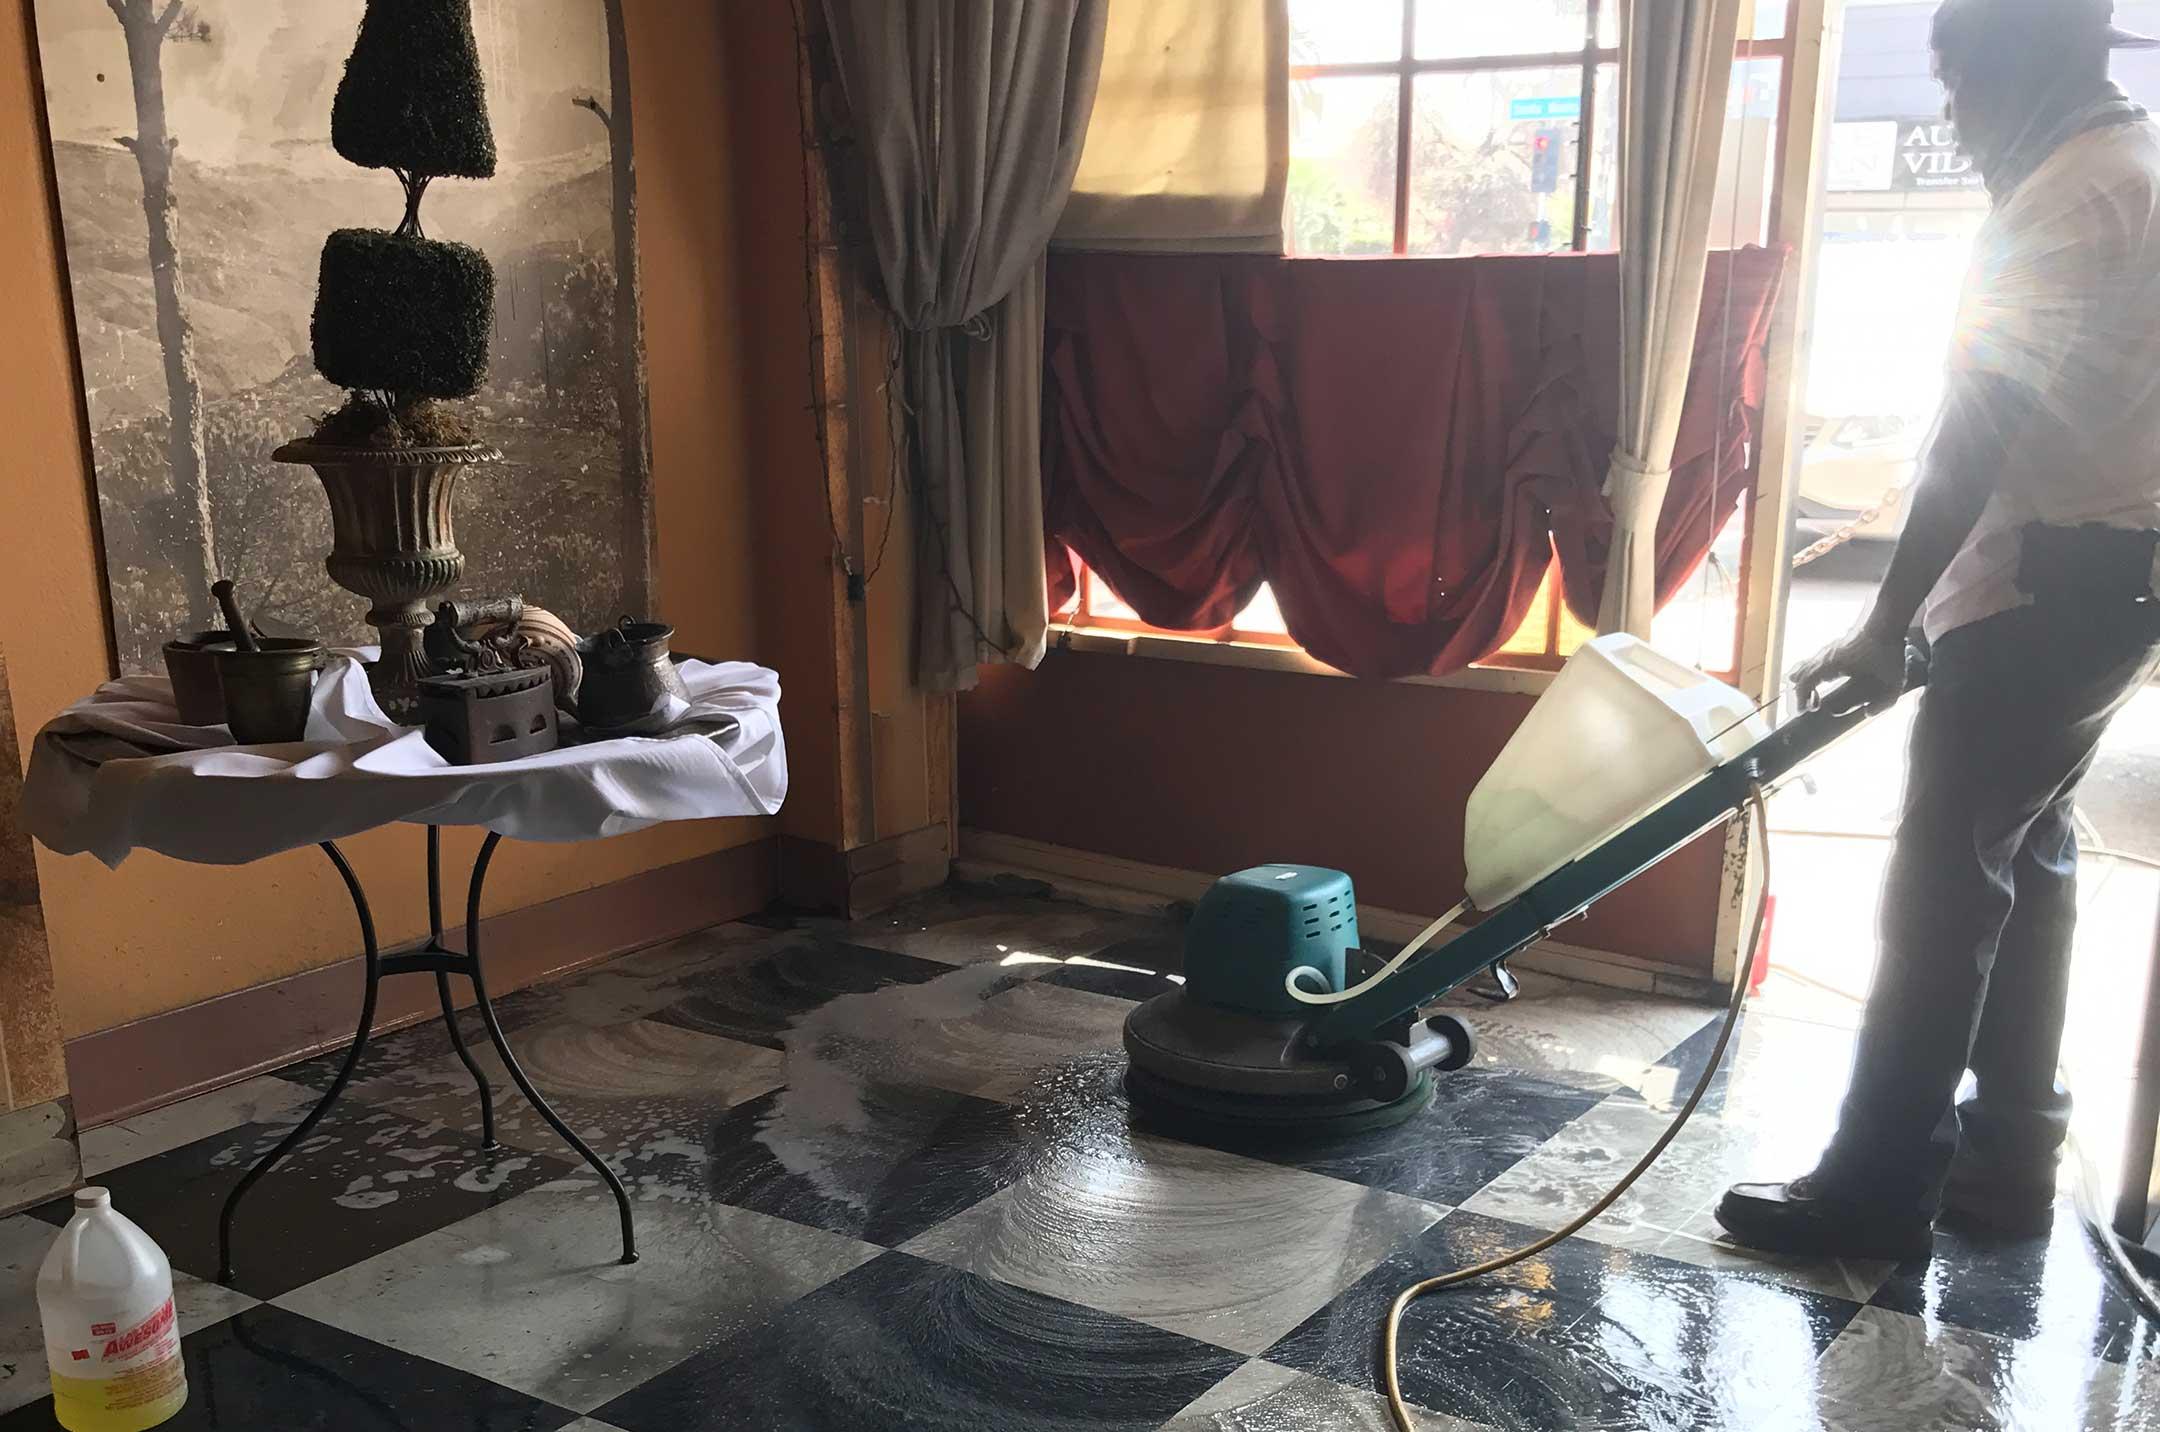 Kingdom Cleaning Services Cerritos, CA | 24 Hour Cleaning Service Cerritos, CA | Floor Cleaning Cerritos, CA